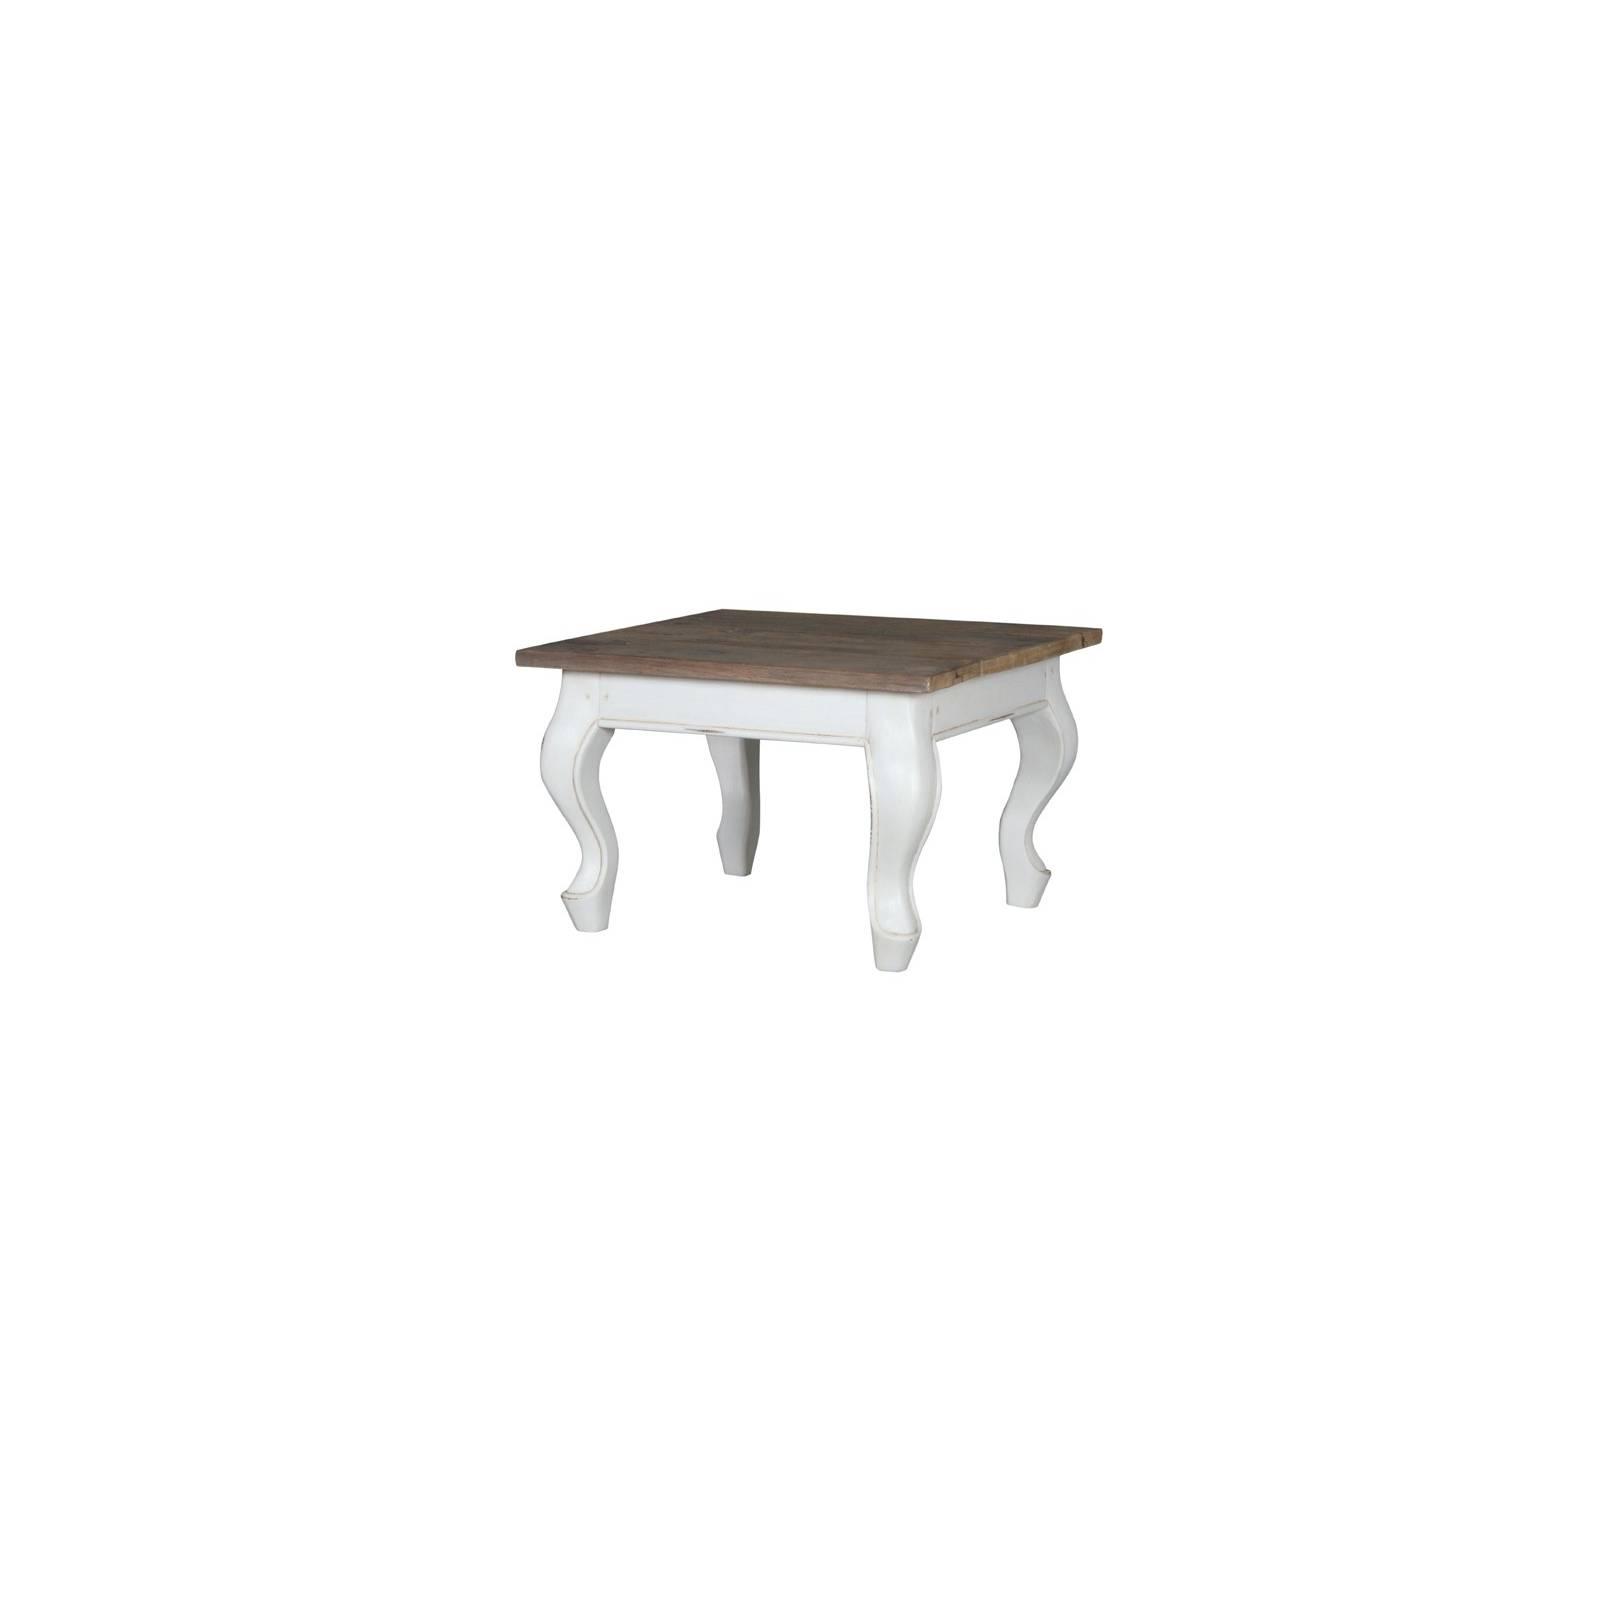 Table Basse Carrée Baroque Olimpia Teck - meuble teck massif